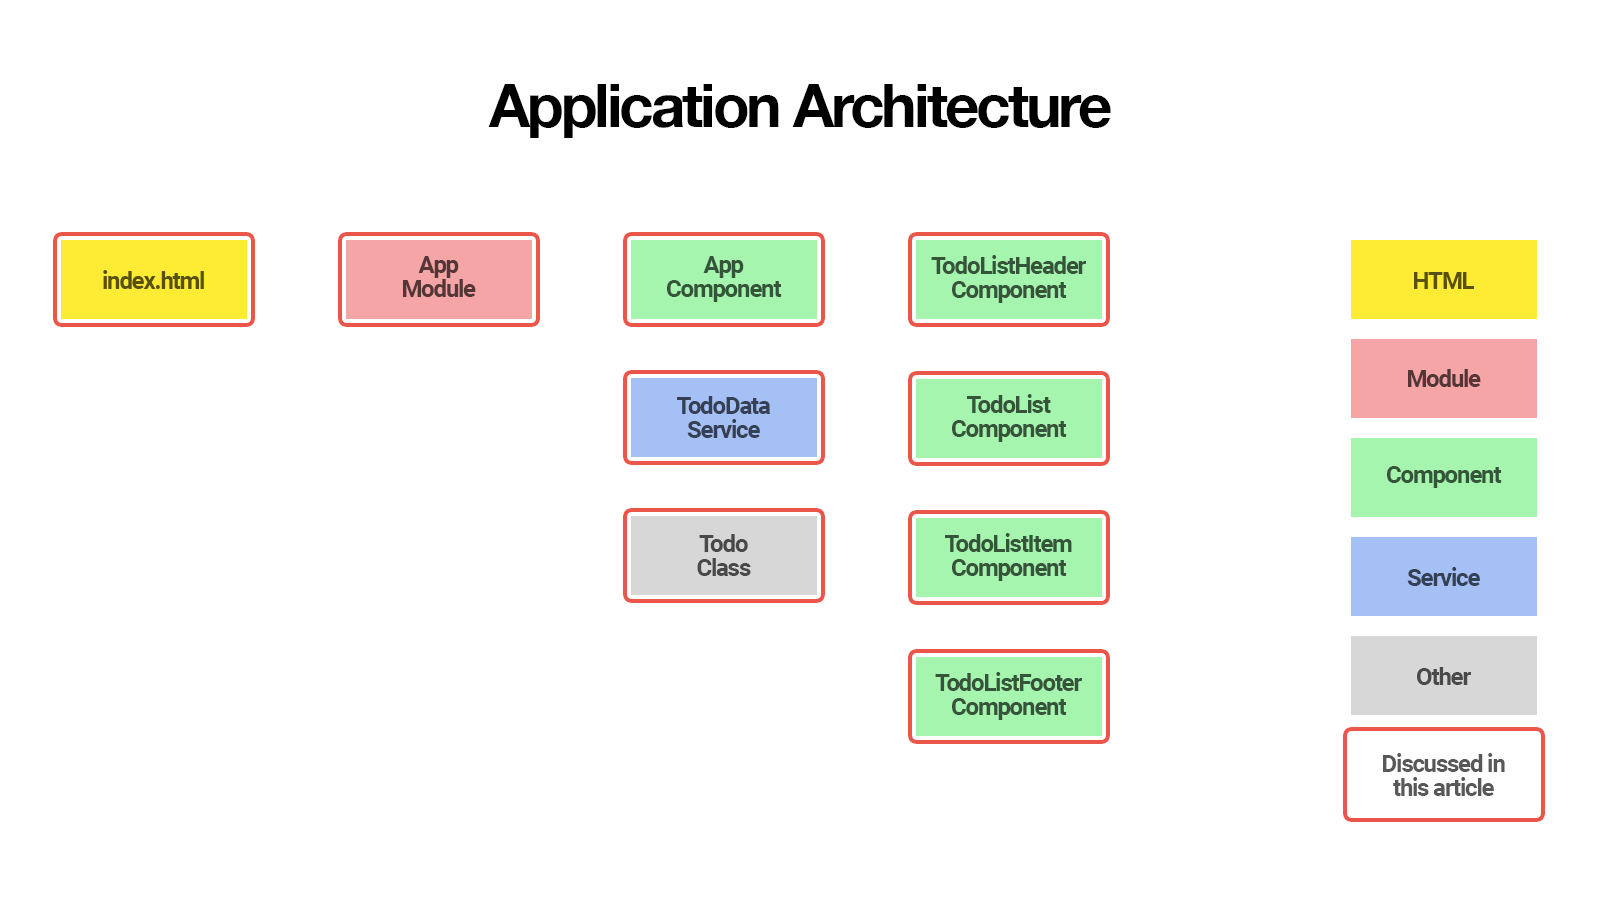 REST API back end: Application Architecture